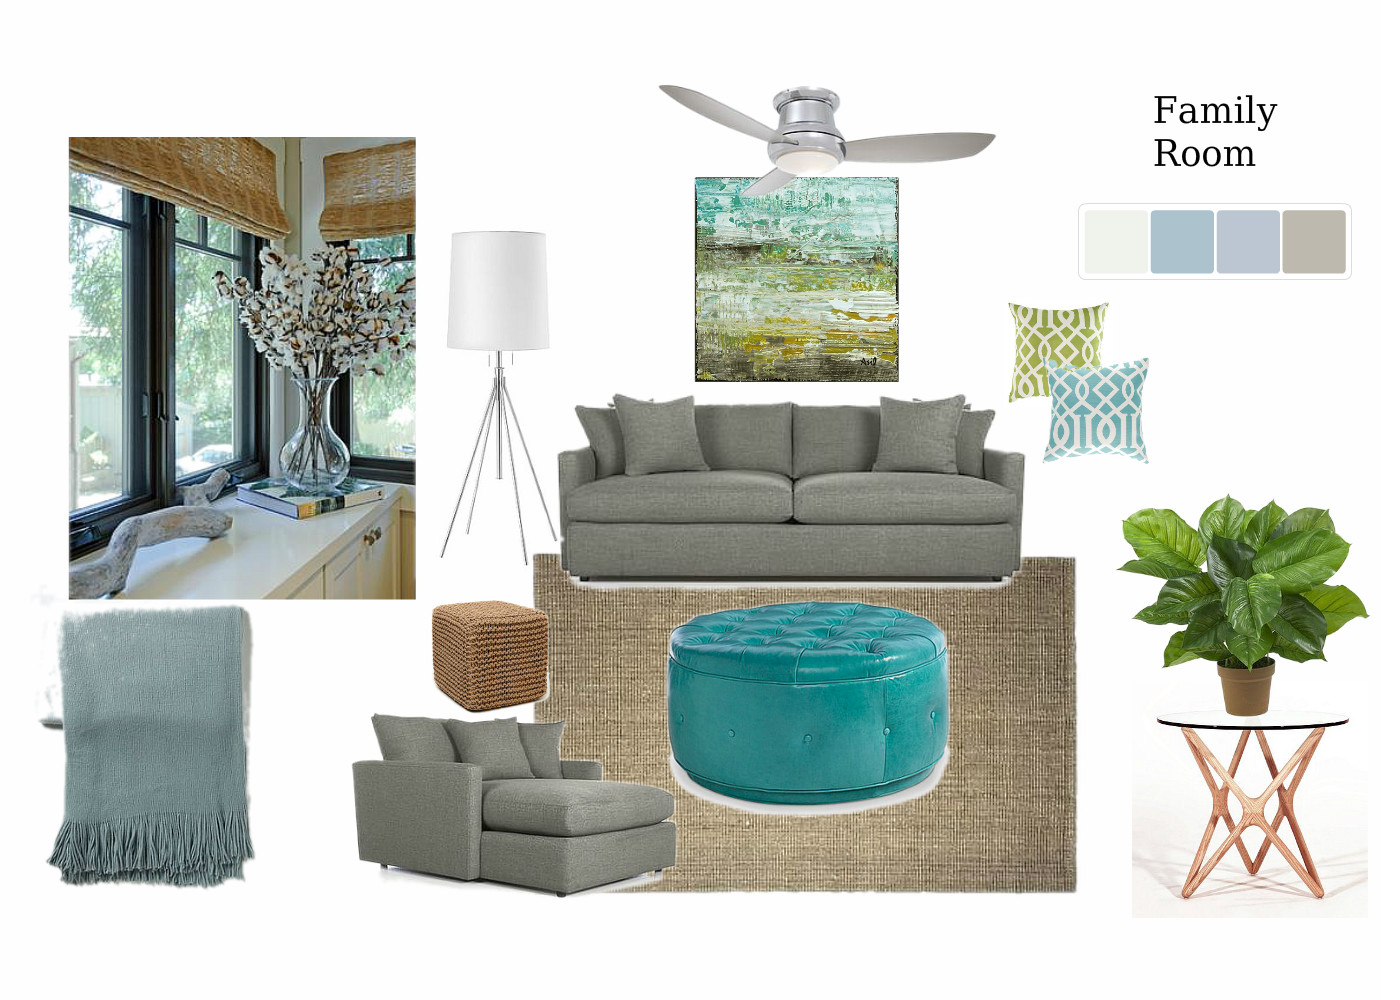 OB-Family Room - Assignment 9.jpg